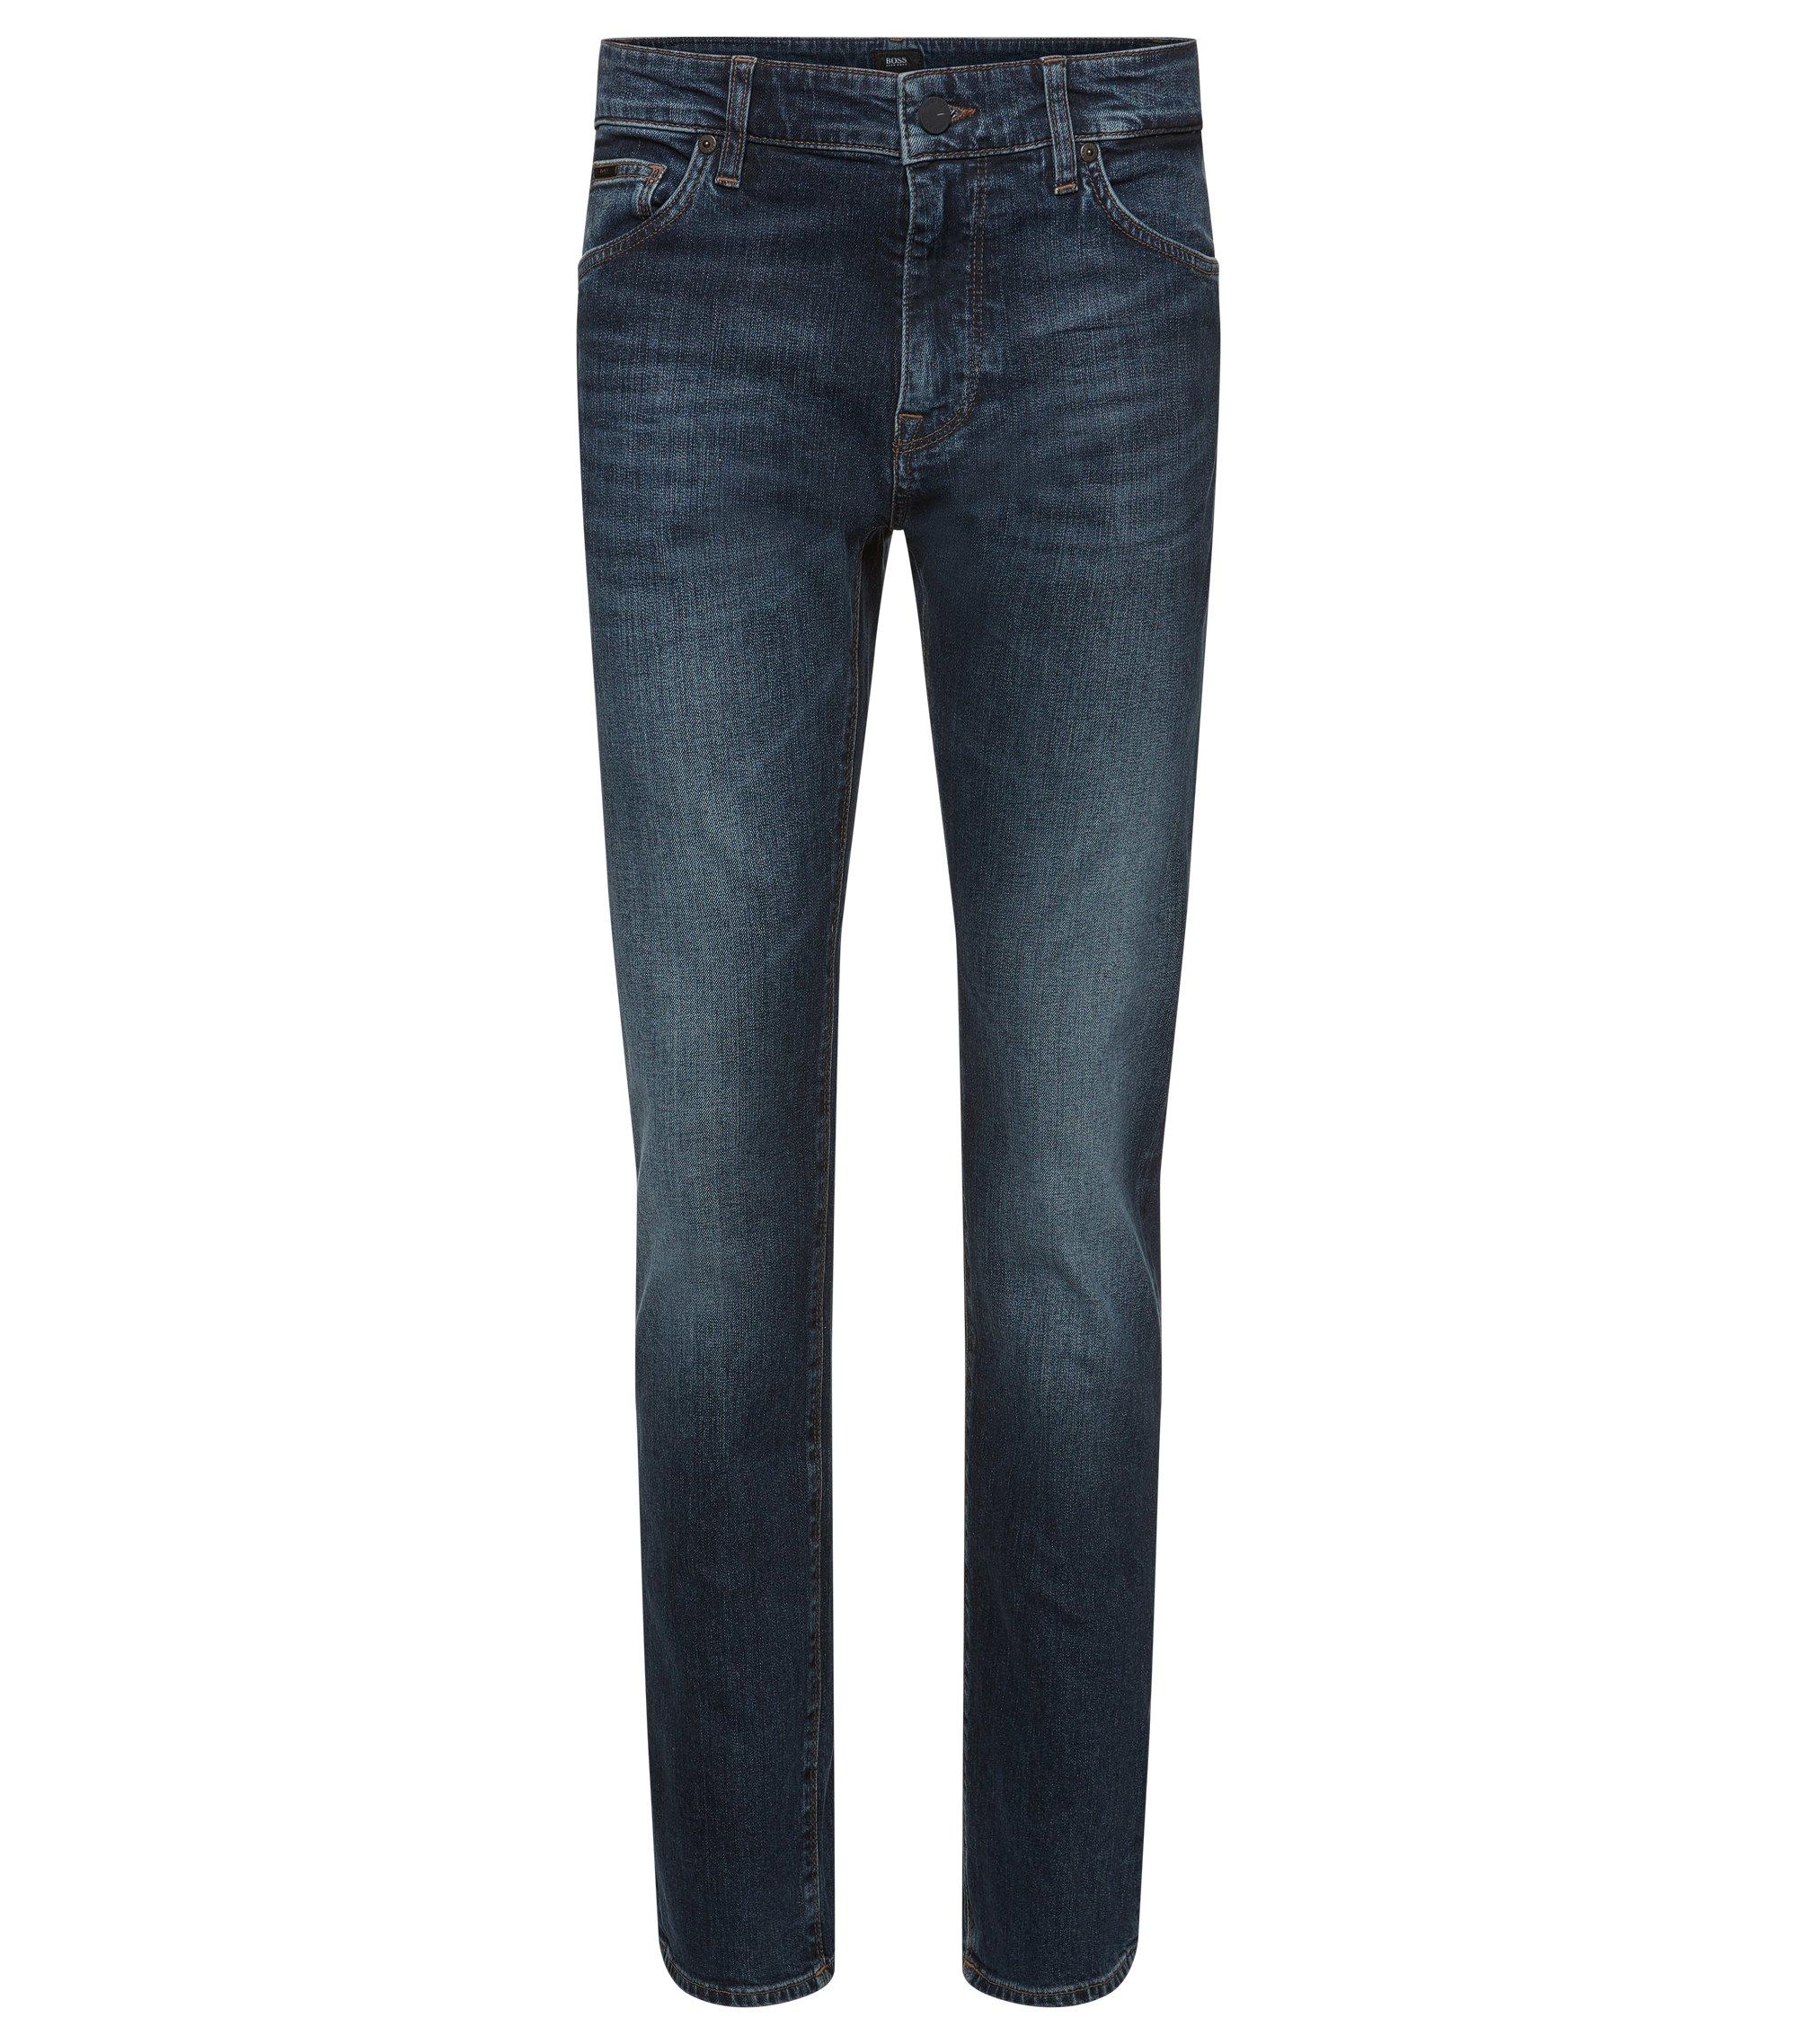 11 oz Stretch Cotton Jeans, Regular Fit   Maine, Blue